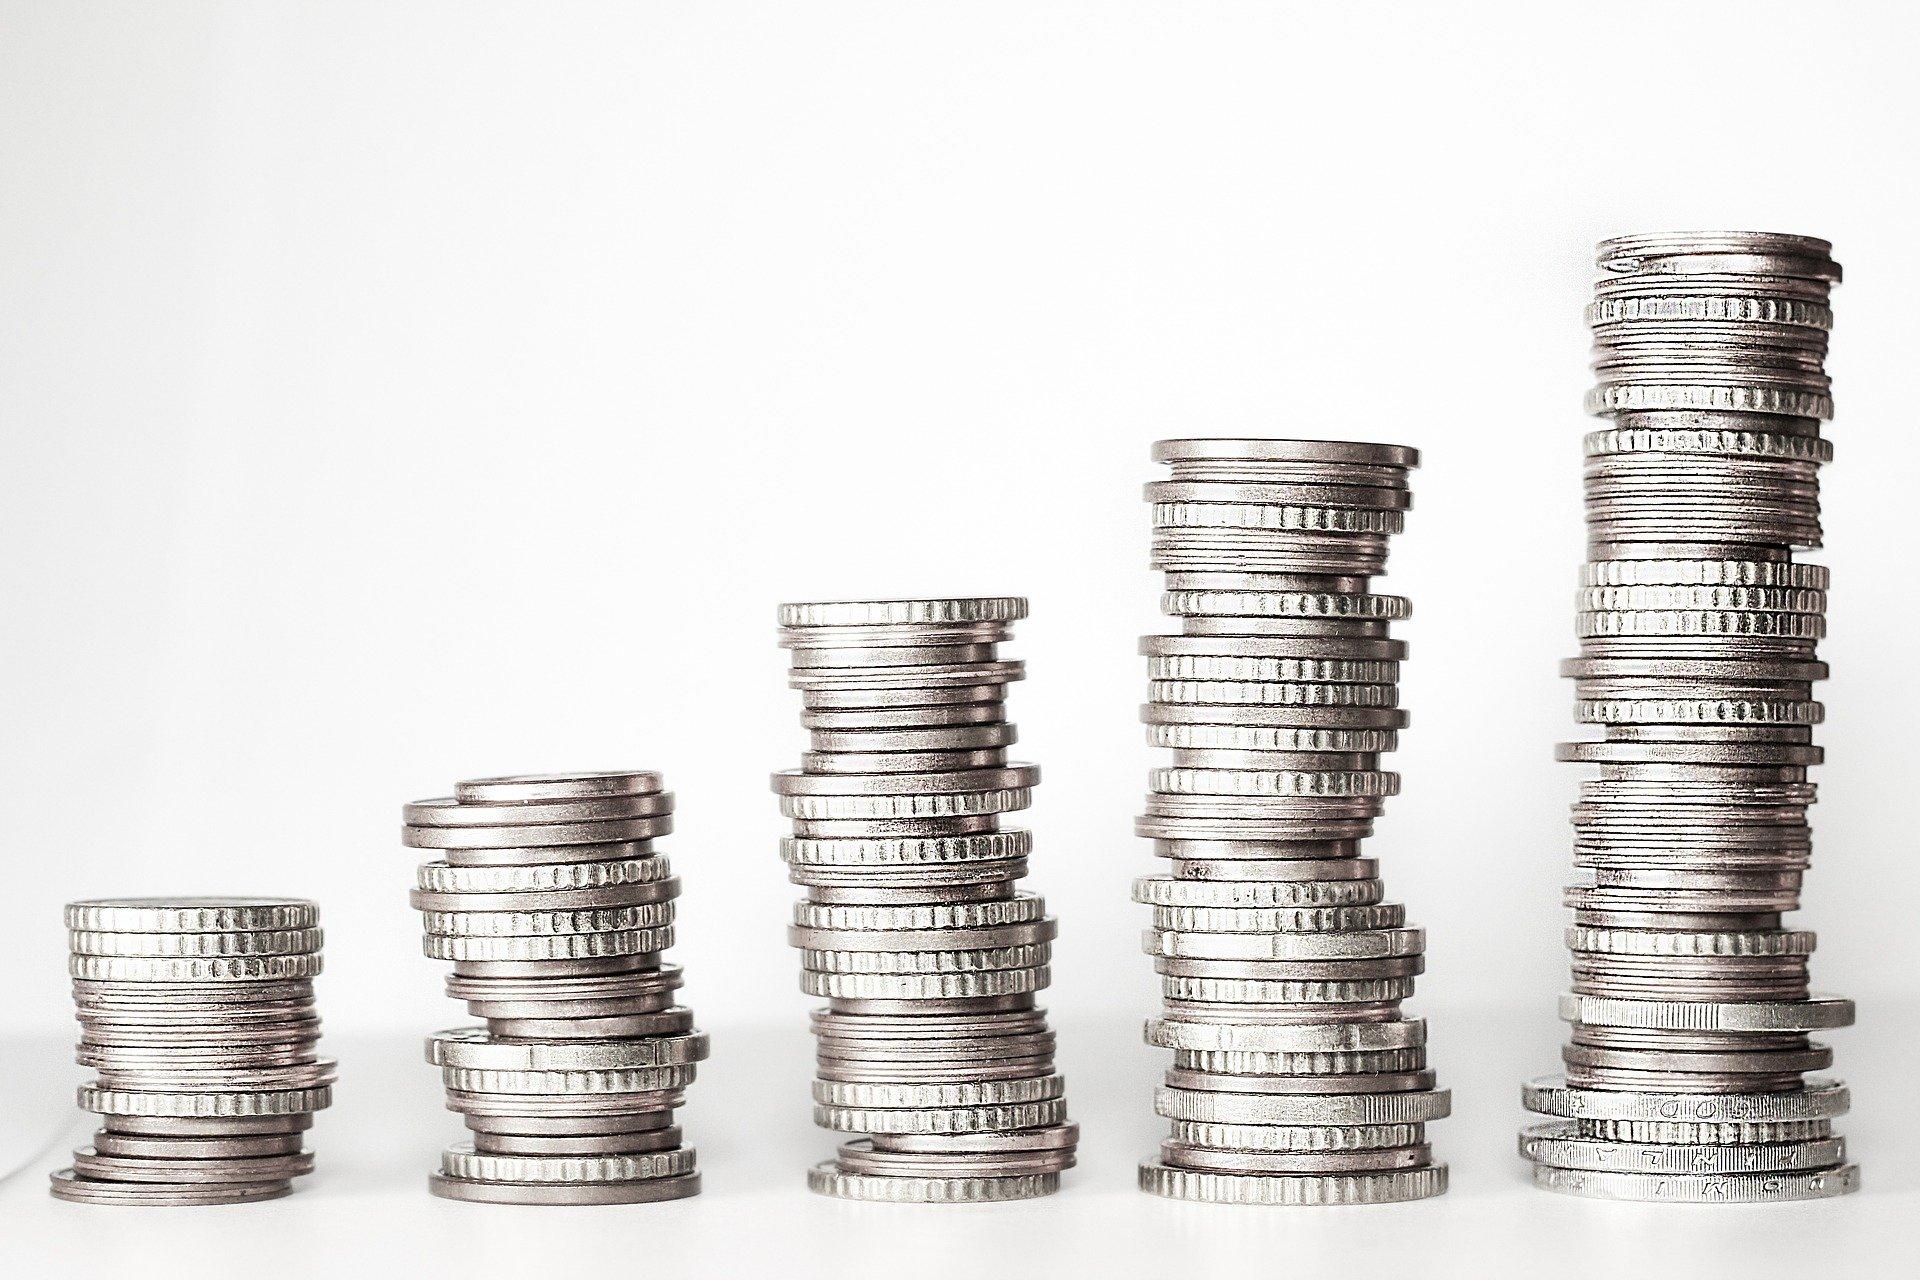 Статия в Investor.bg: Moody's повиши кредитния рейтинг на България до ниво Baa11 - Stonehard